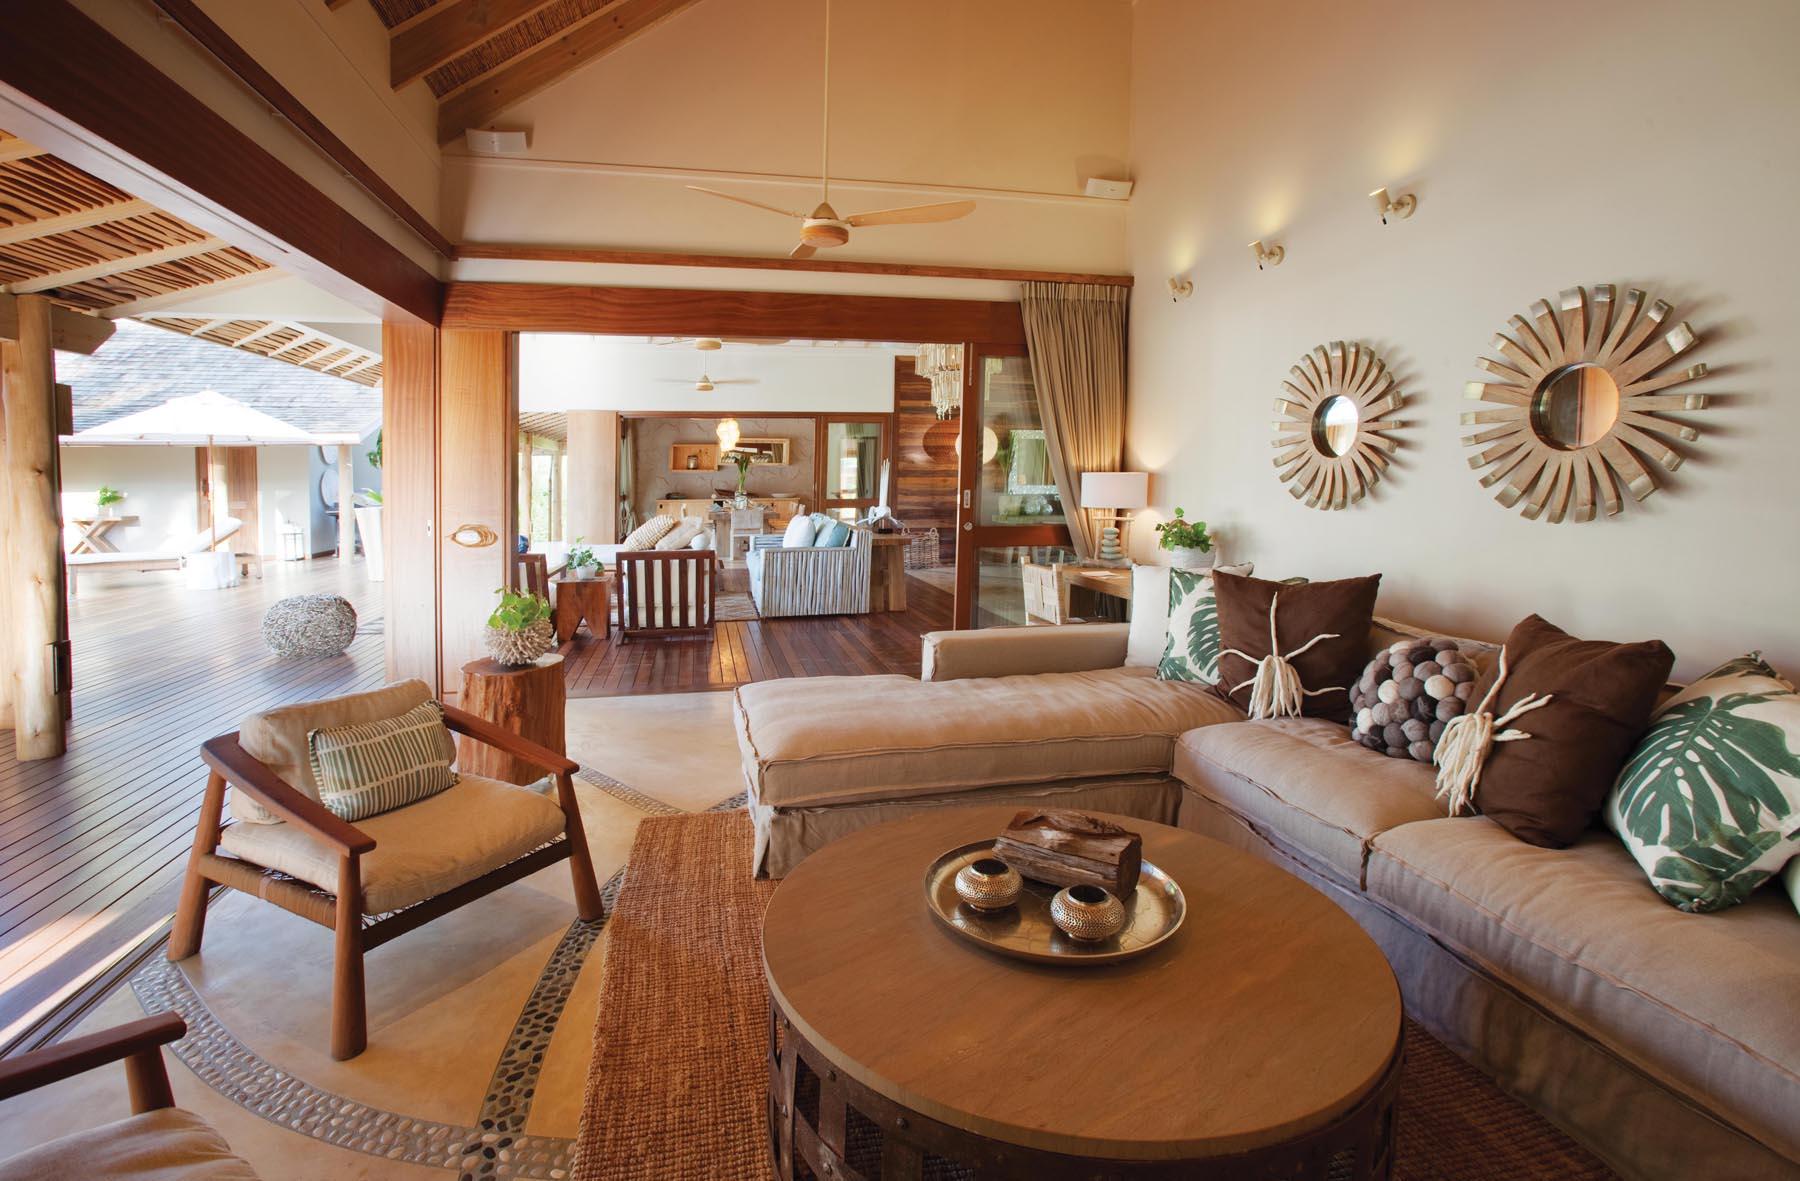 Desroches Island Resort Paradise In Seychelles Idesignarch Interior Design Architecture Interior Decorating Emagazine